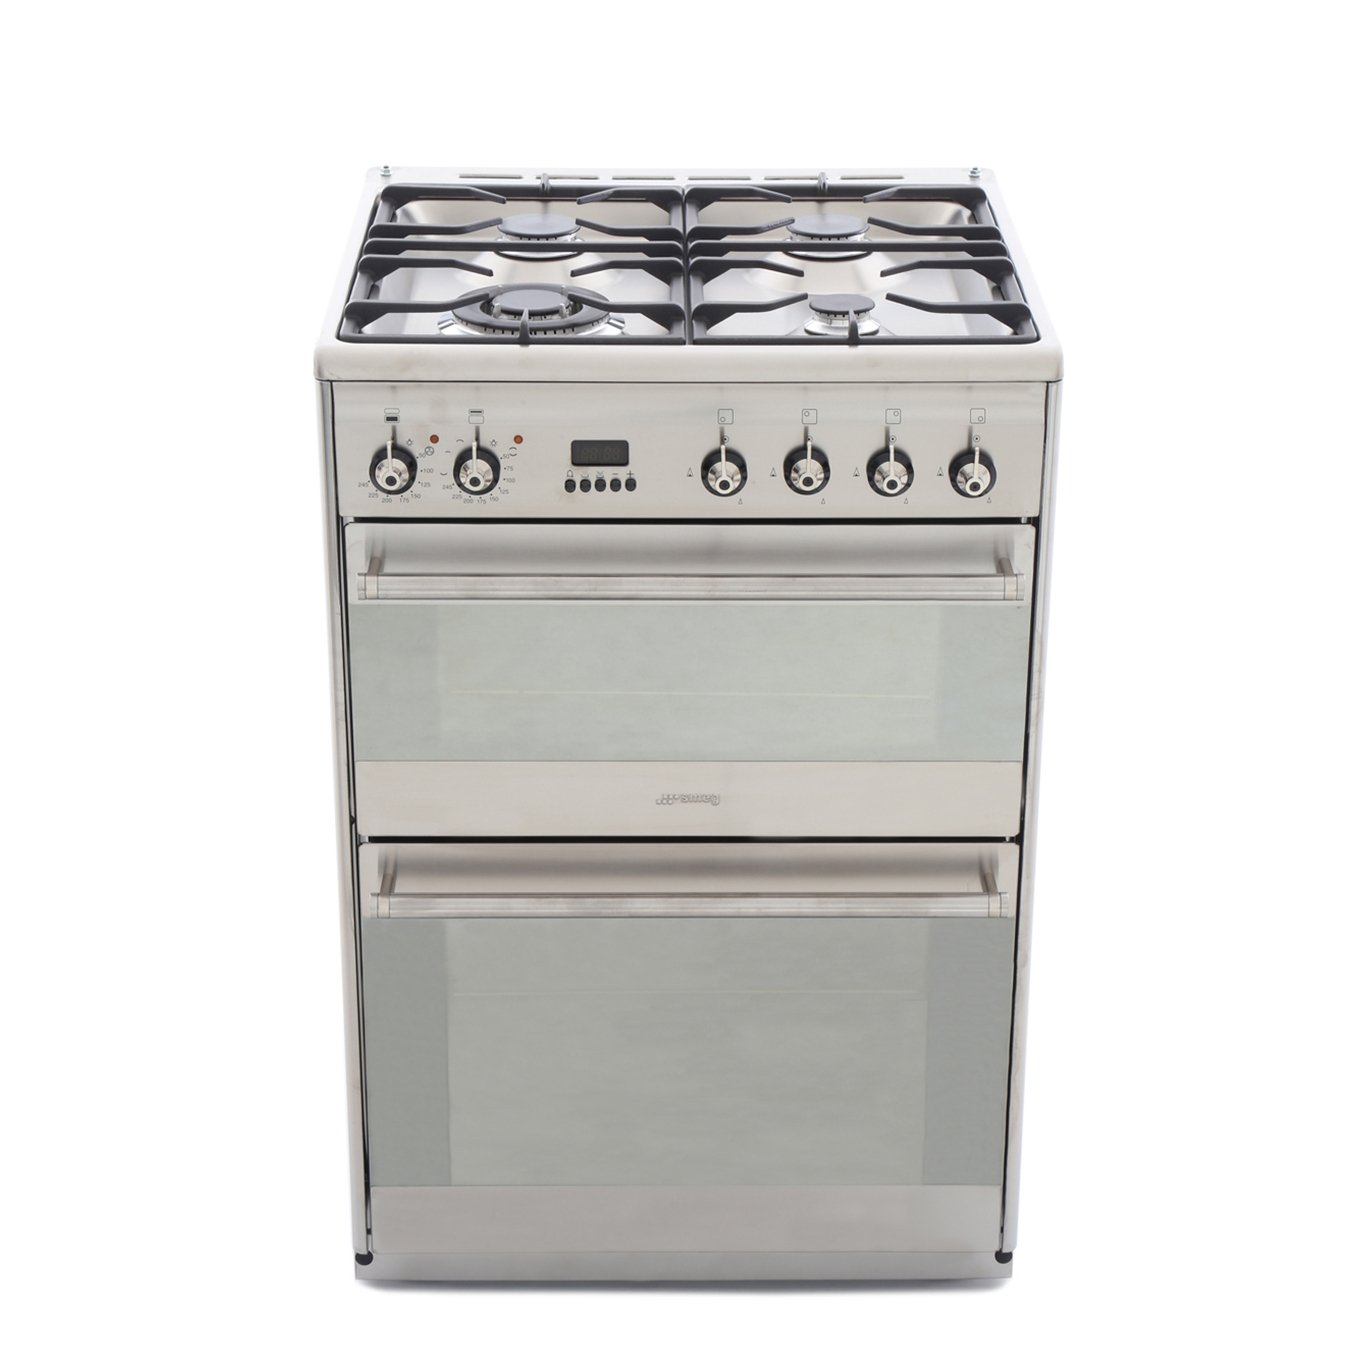 Smeg Concert SUK62MX8 Dual Fuel Cooker with Double Oven